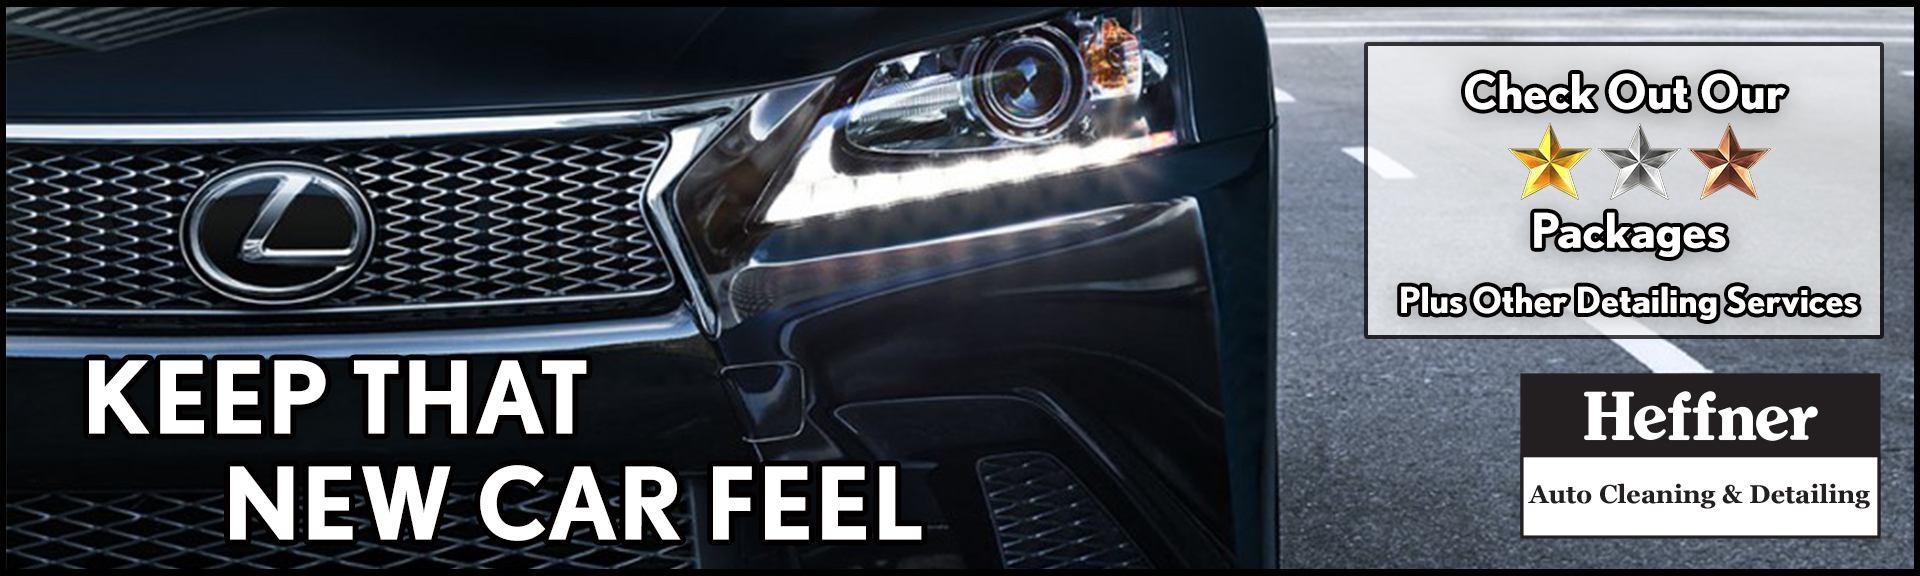 Detailing Banner Ad_Lexus